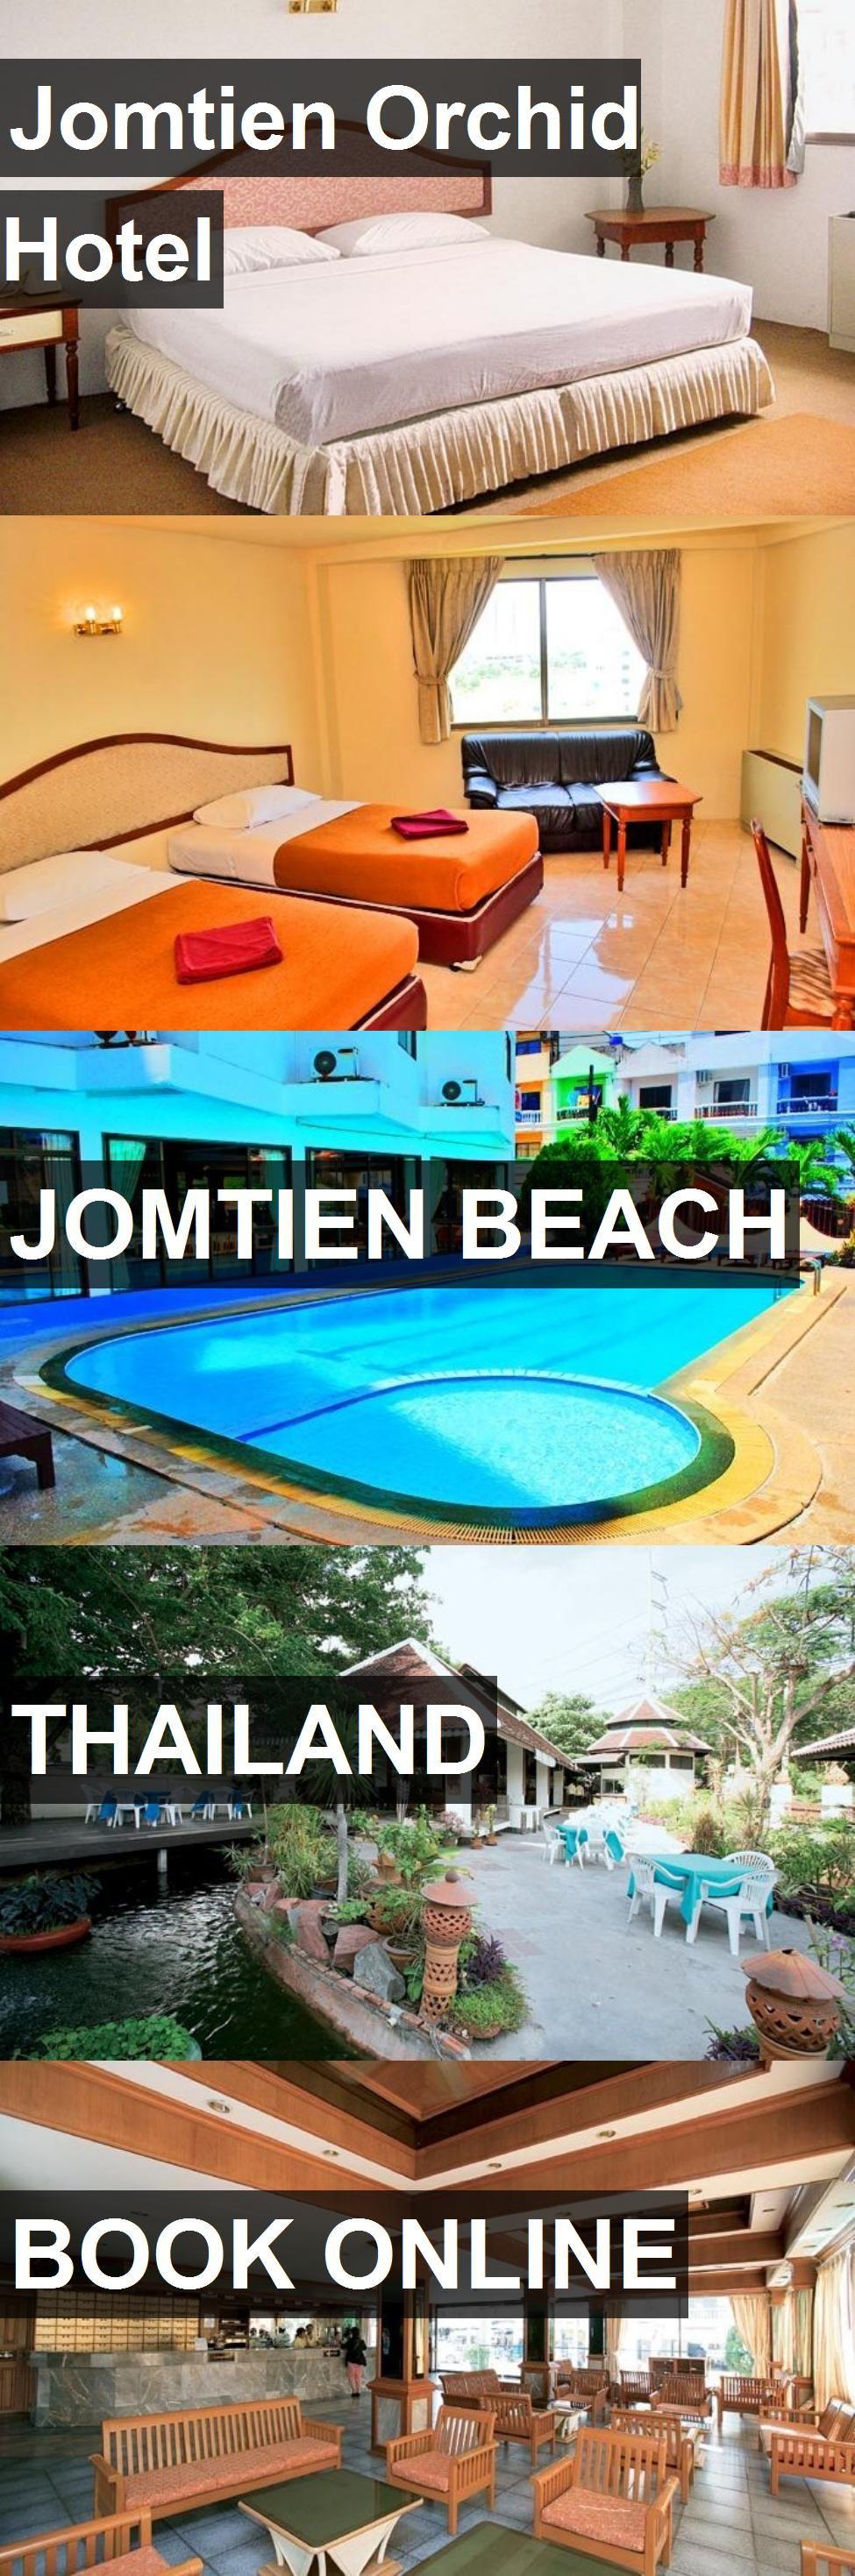 Hotel jomtien orchid hotel in jomtien beach thailand for more